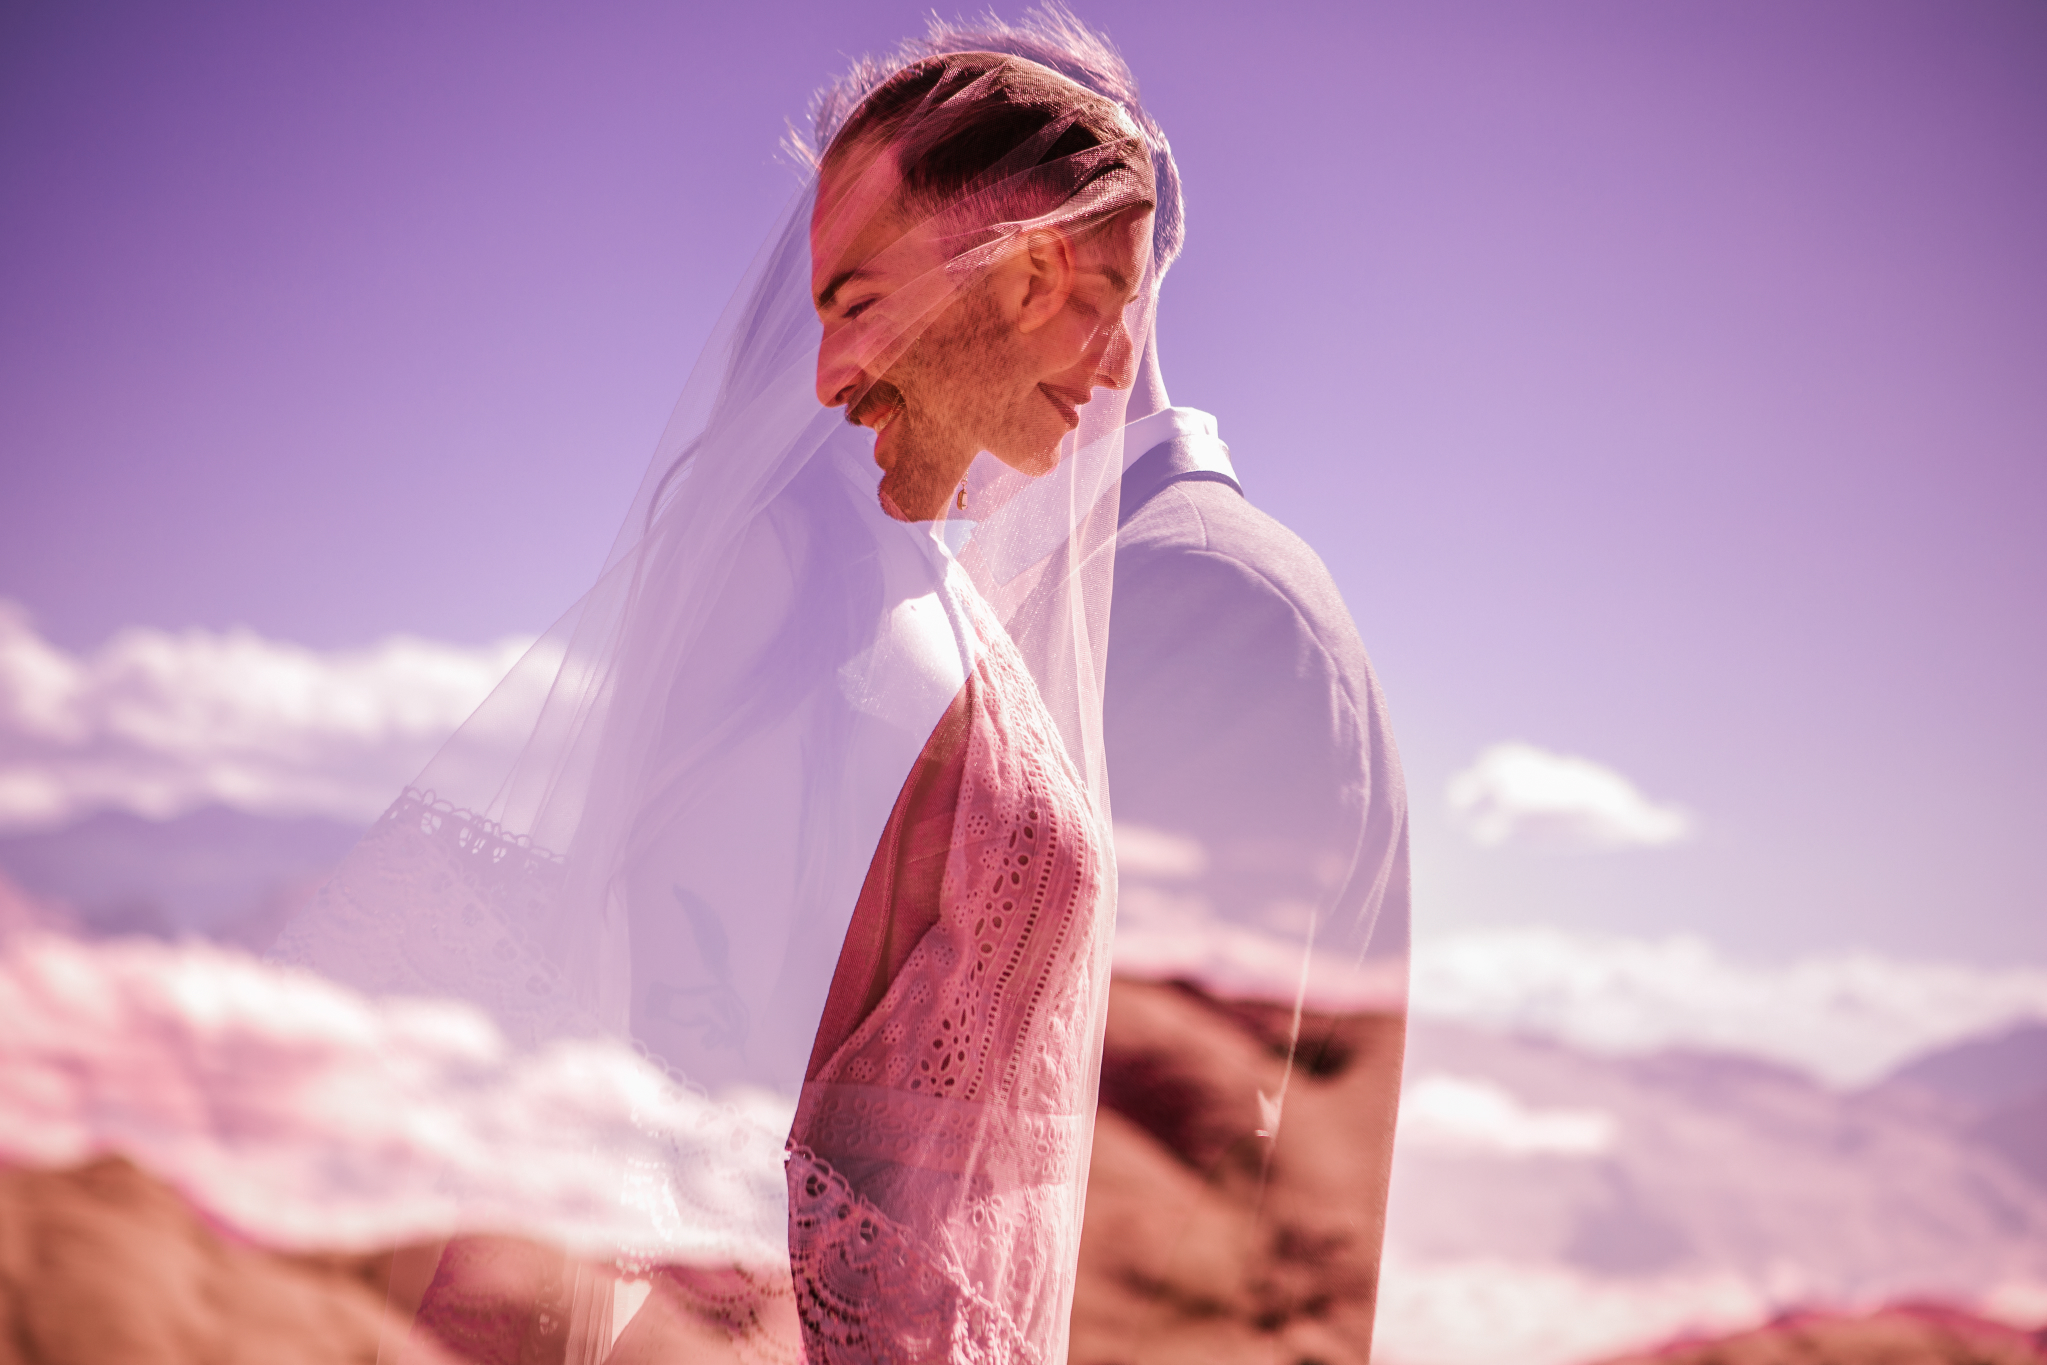 san diego wedding   photographer | double exposure man and woman